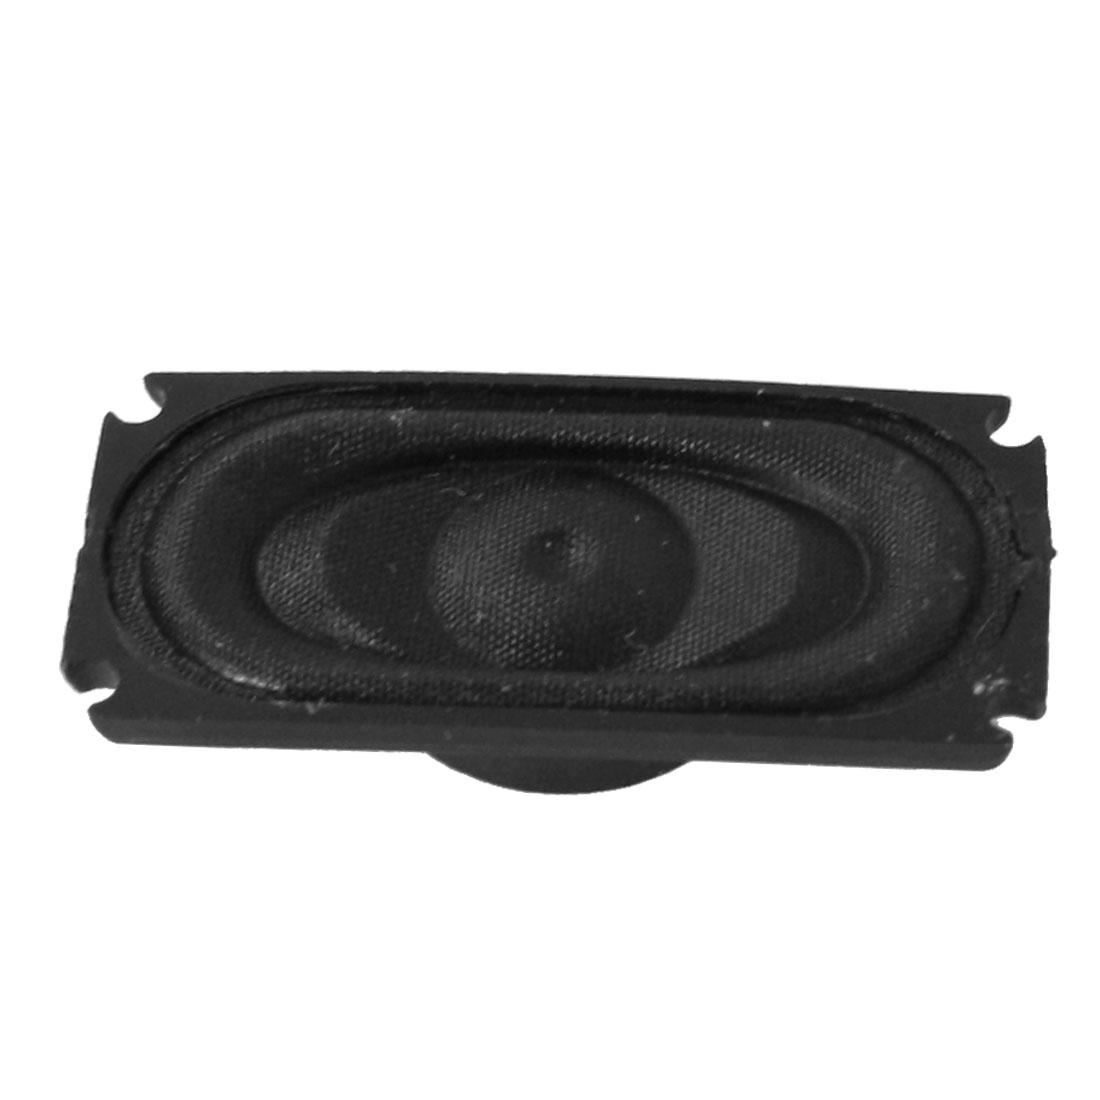 35mm x 16mm Internal Type Speaker Trumpet Horn 1 Ohm 8W